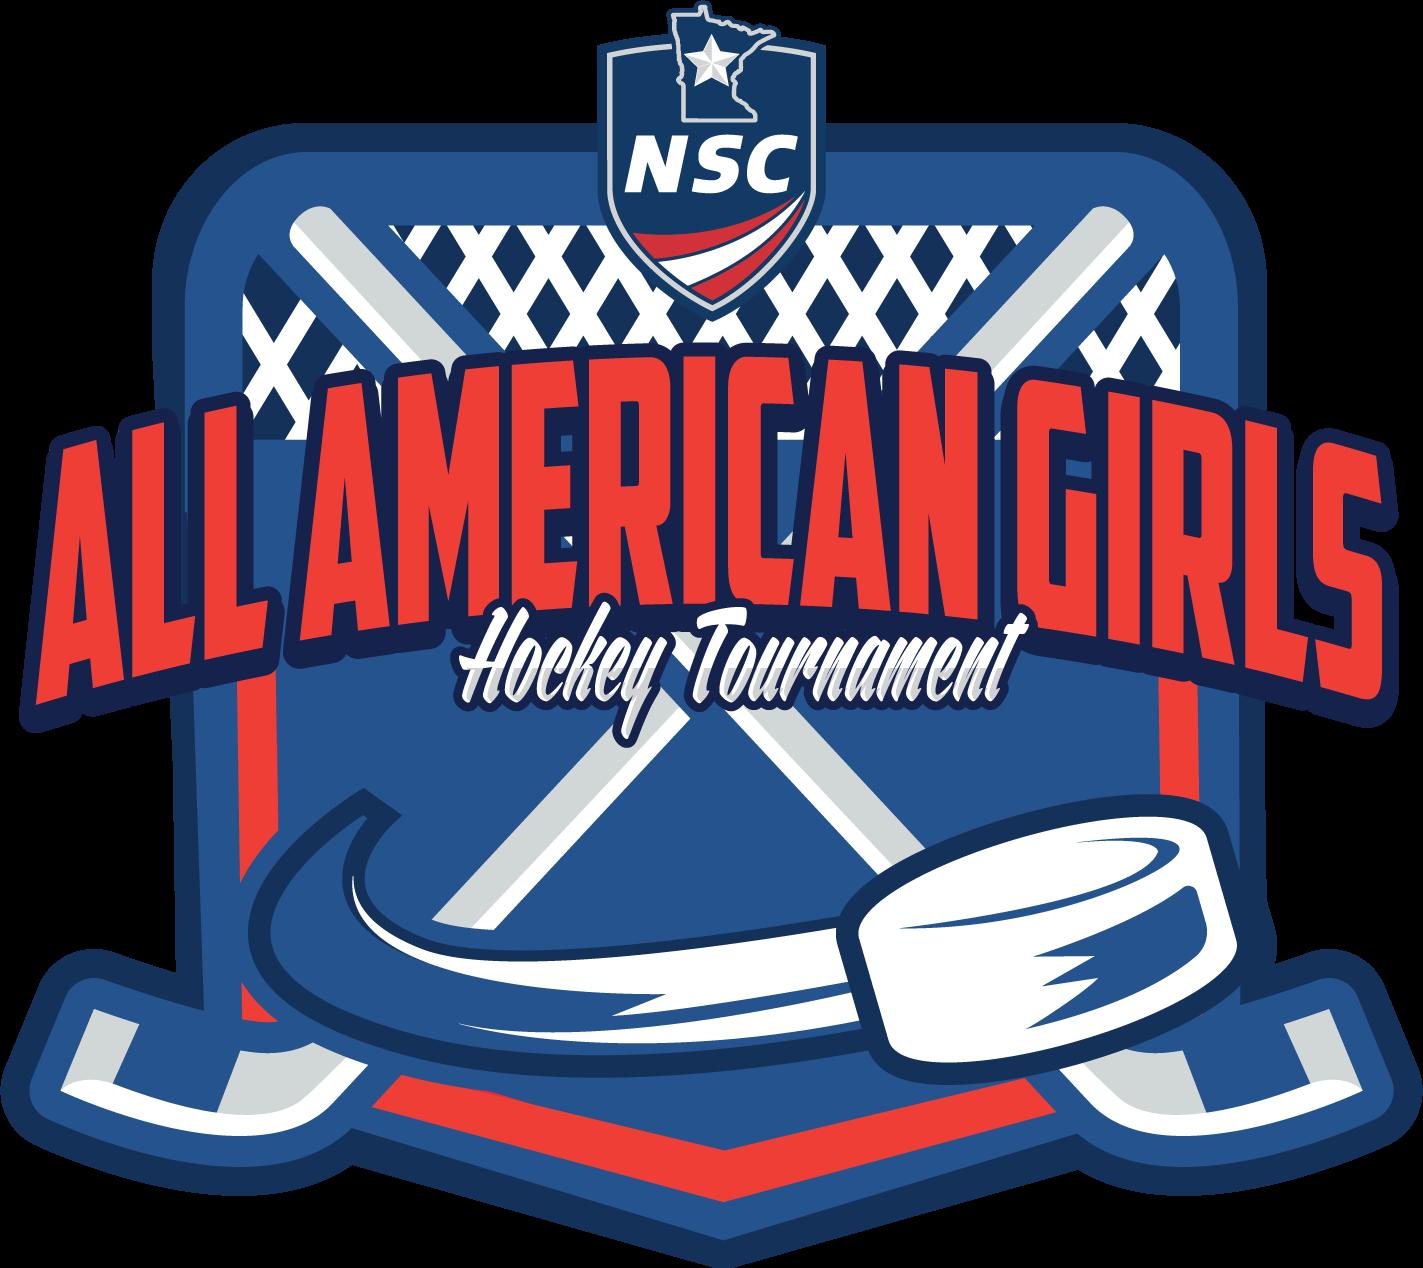 All-American Girls Hockey Tournament Logo